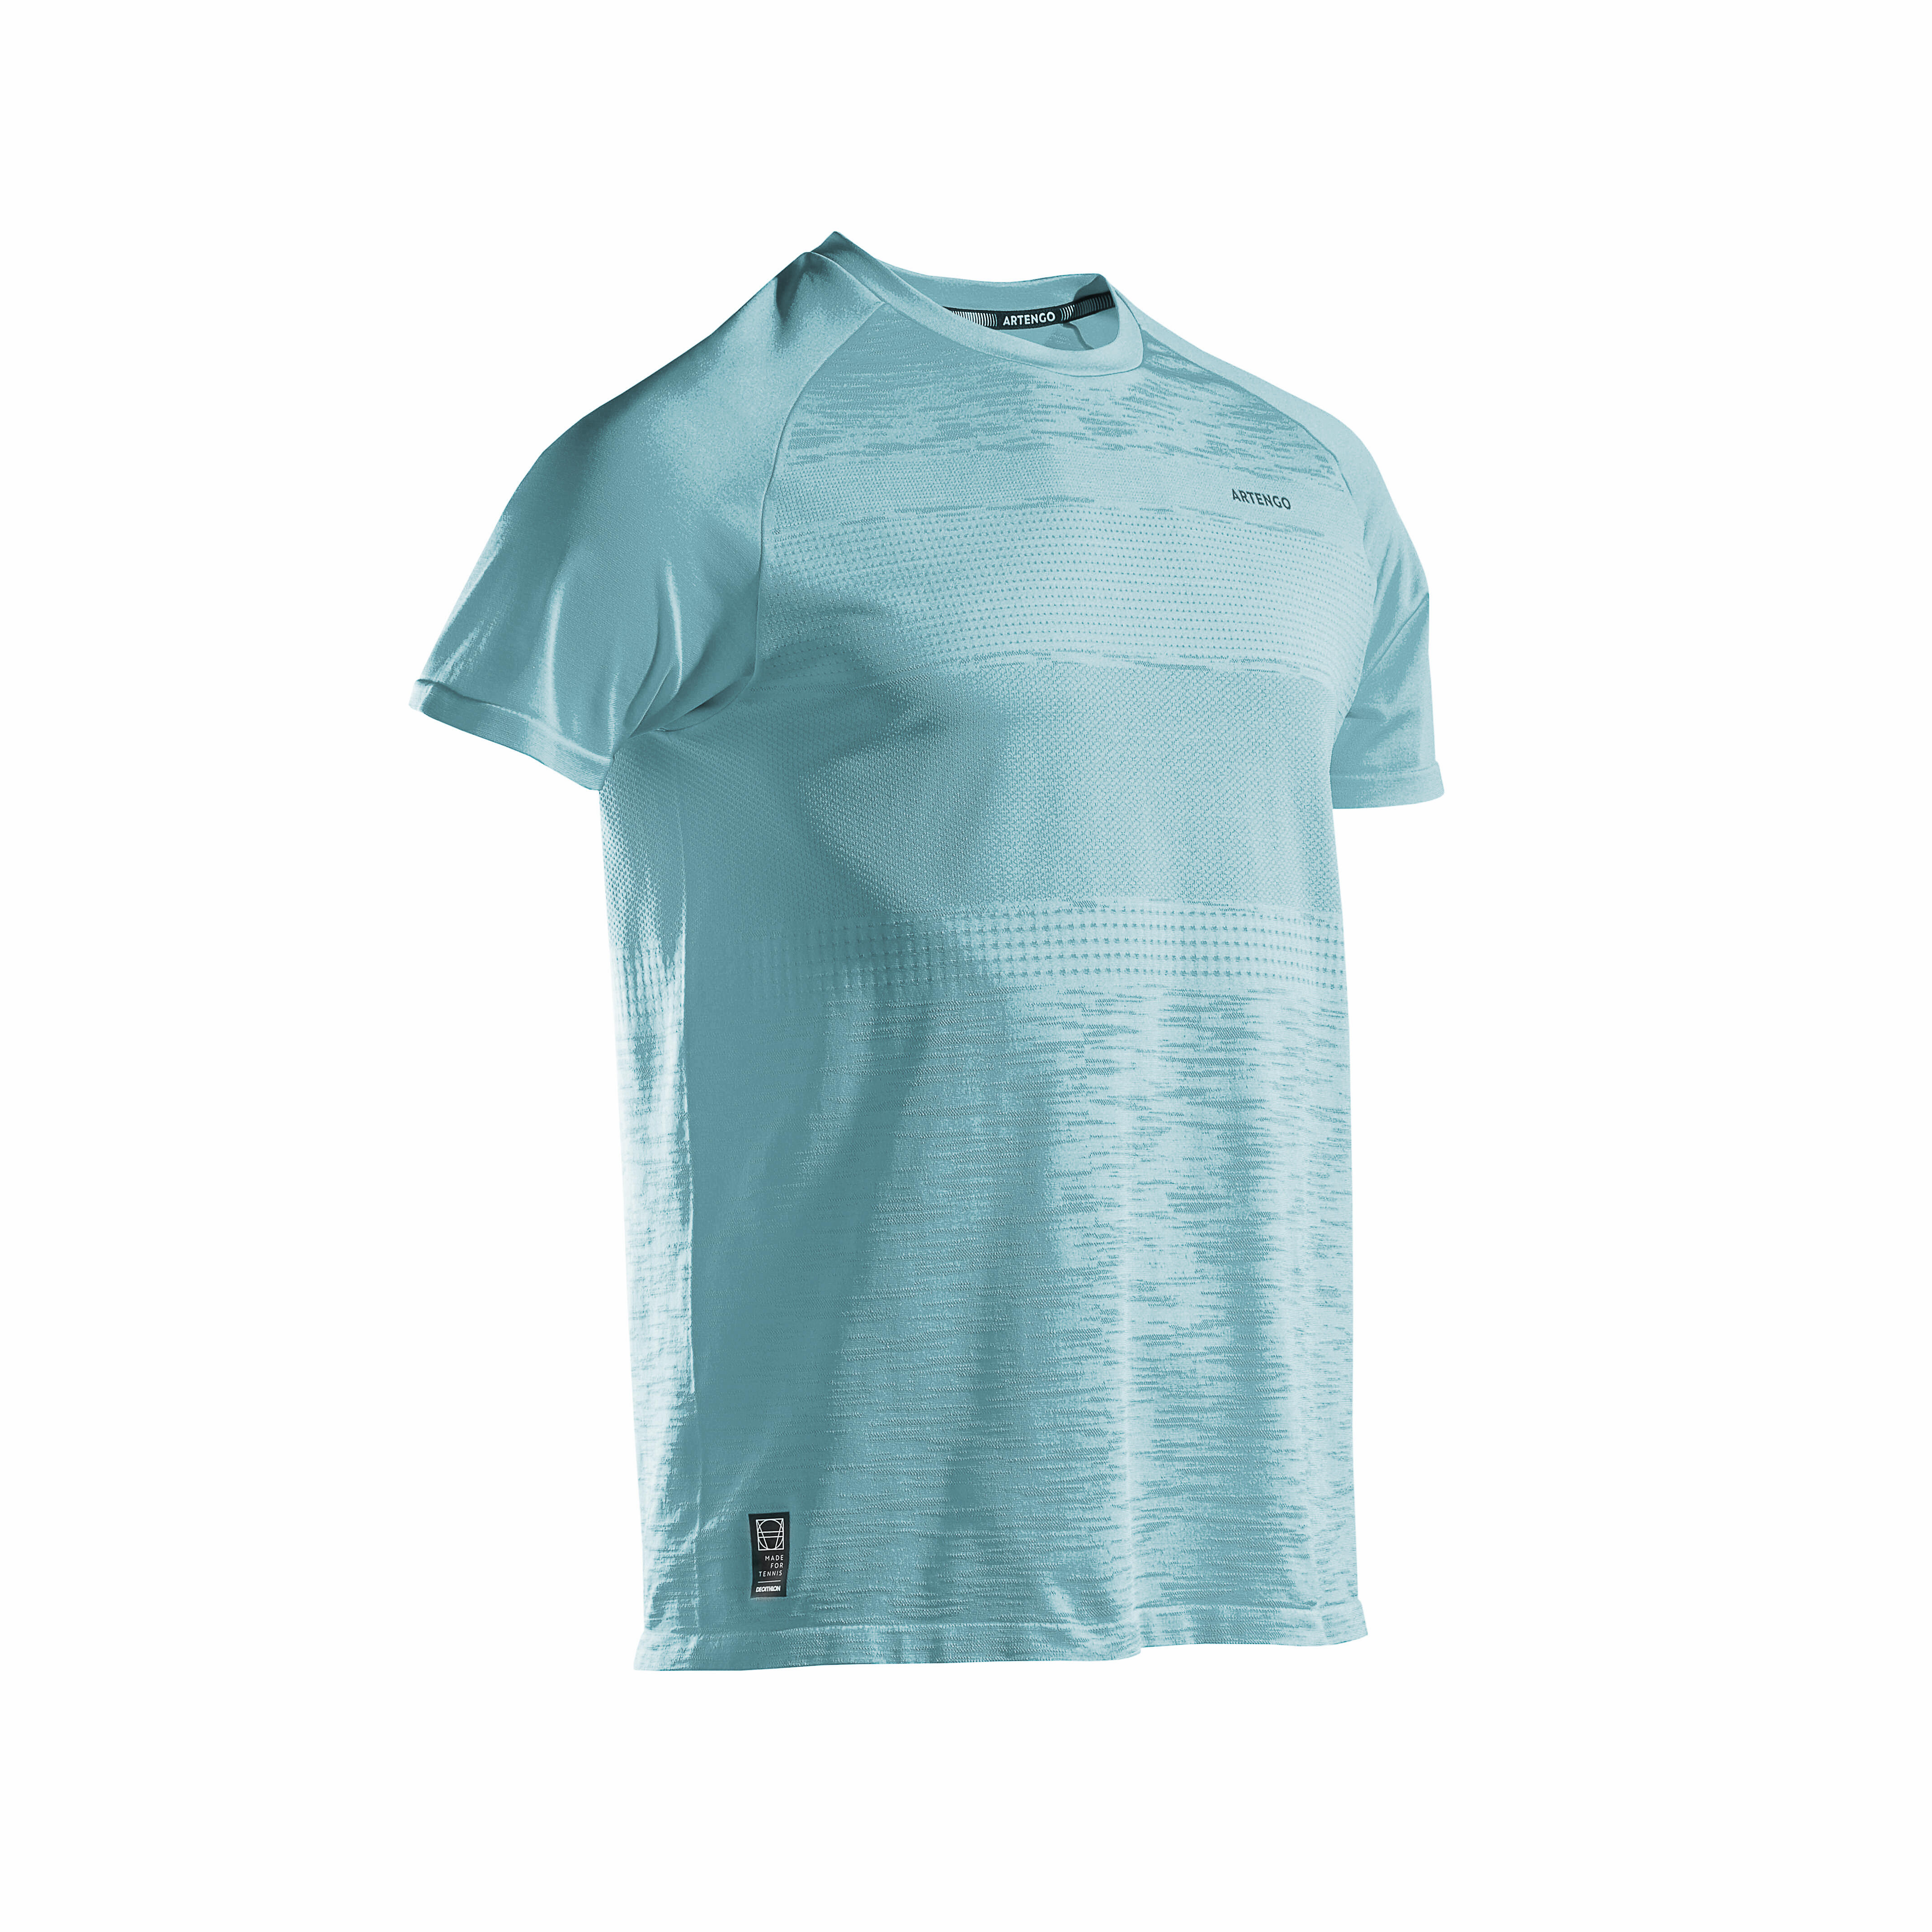 Tricou Tenis TTS Soft Bărbați imagine